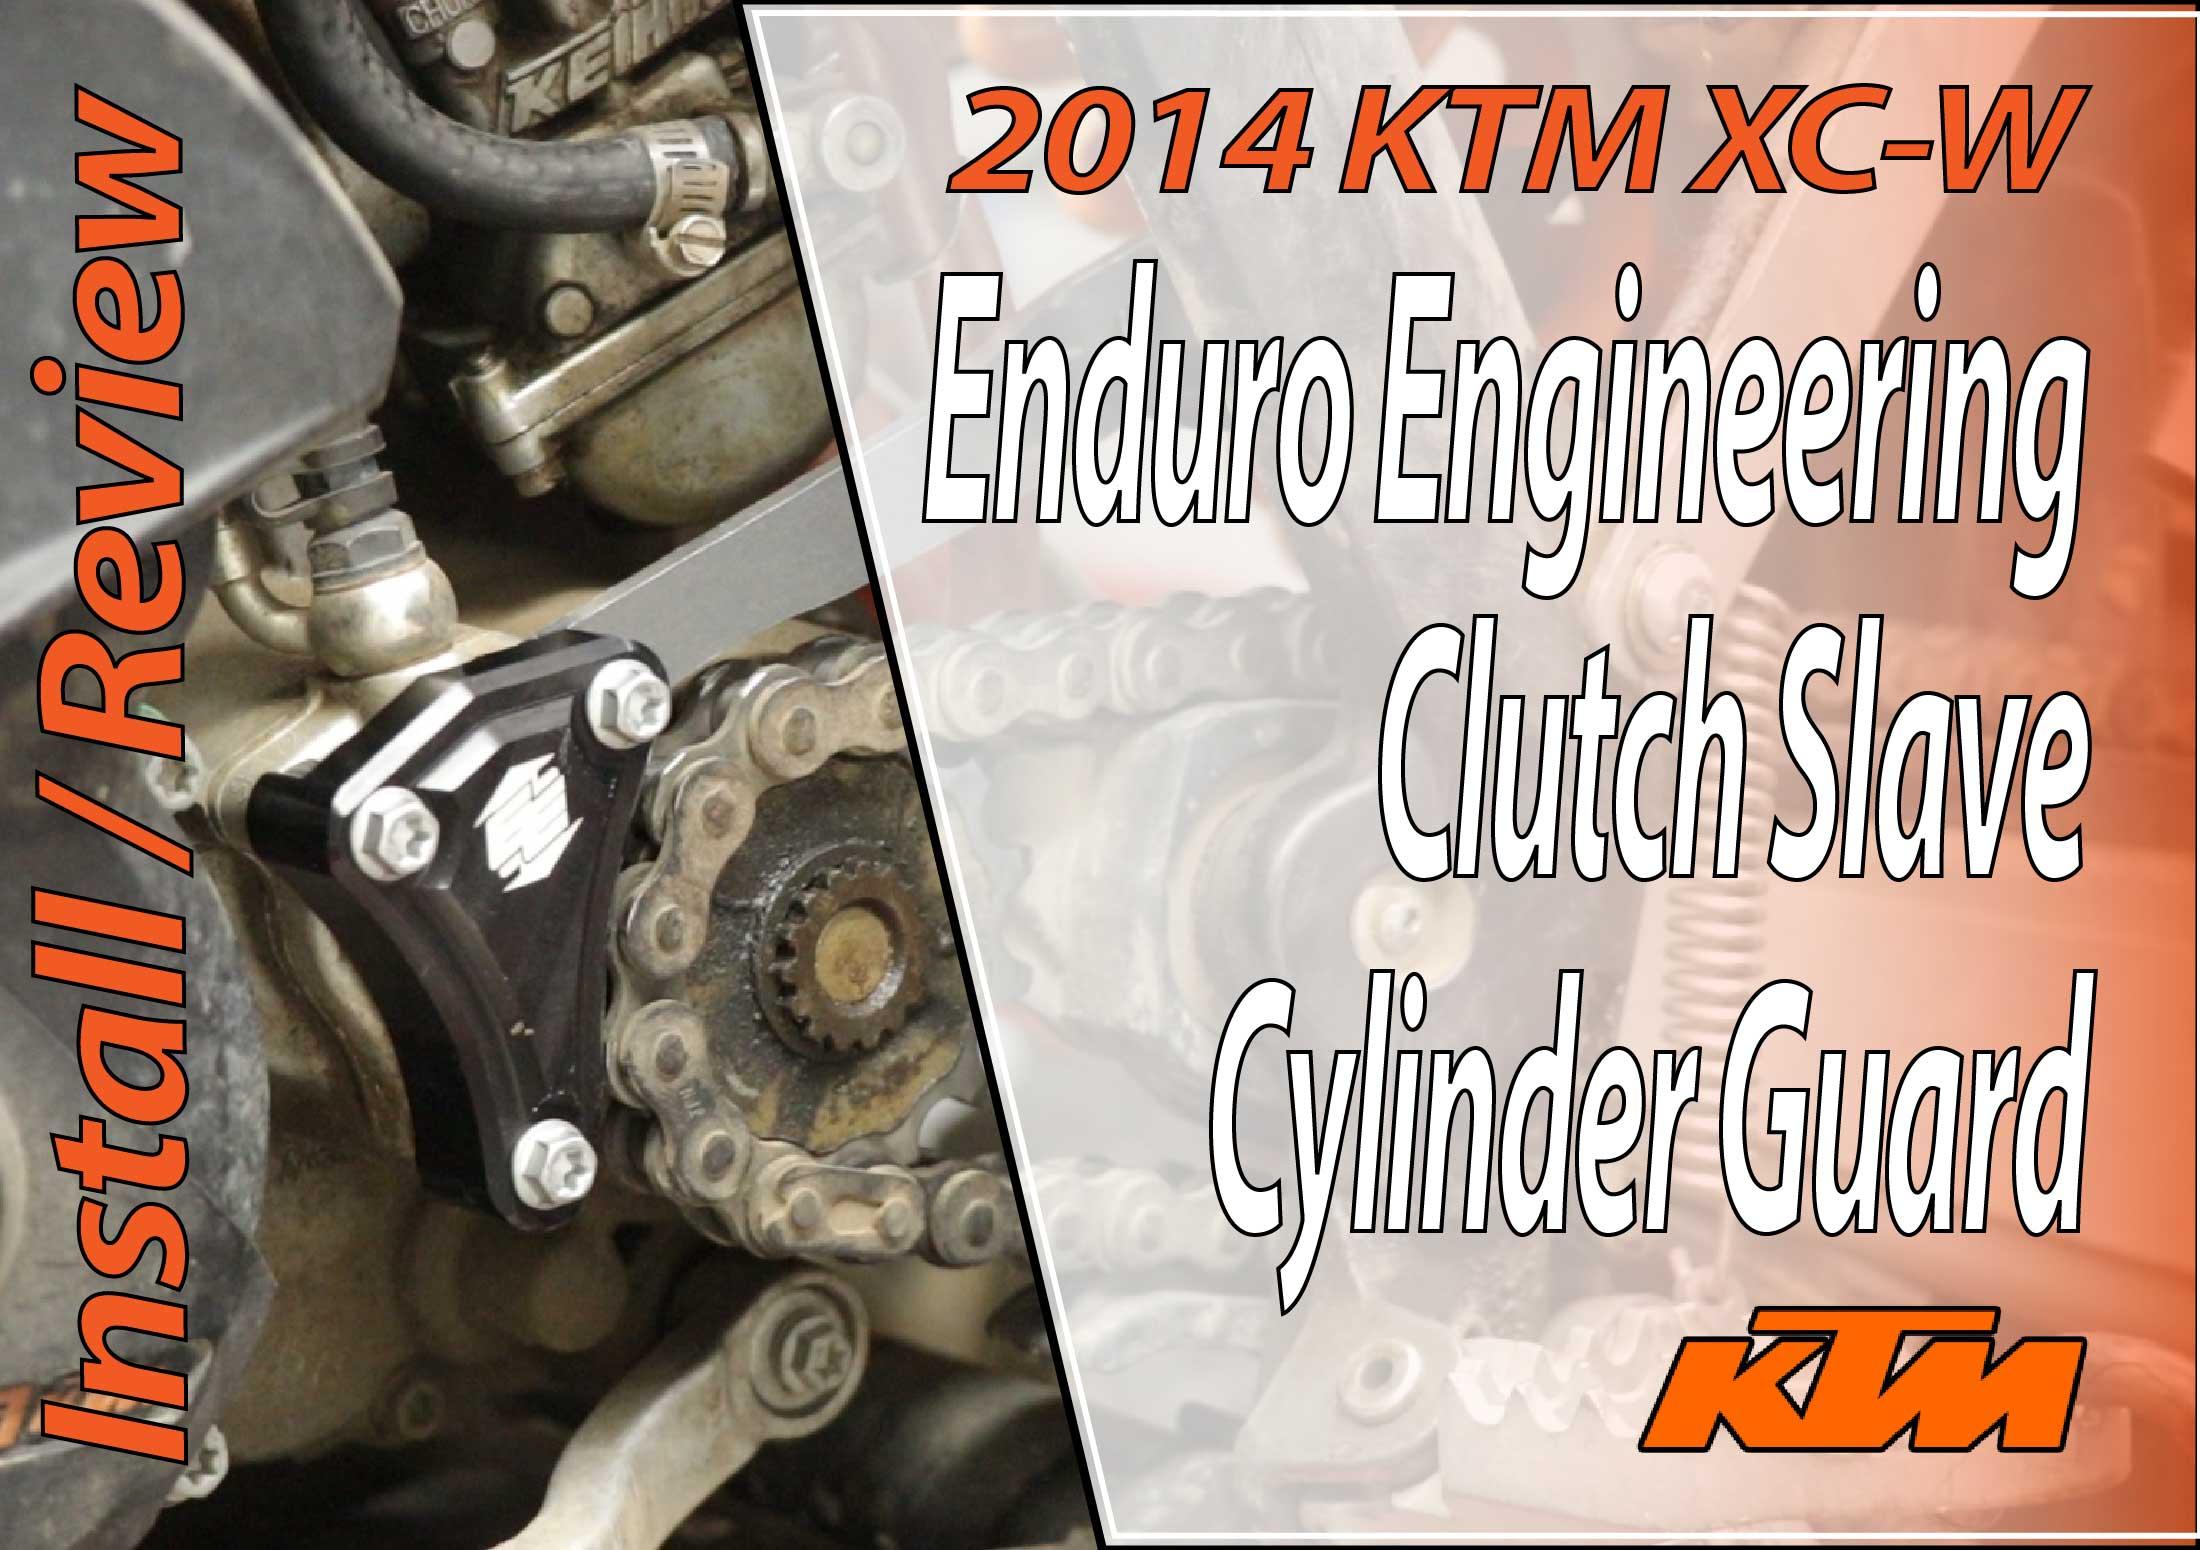 2014 KTM 300 XC-W - Enduro Engineering Clutch Slave Cylinder